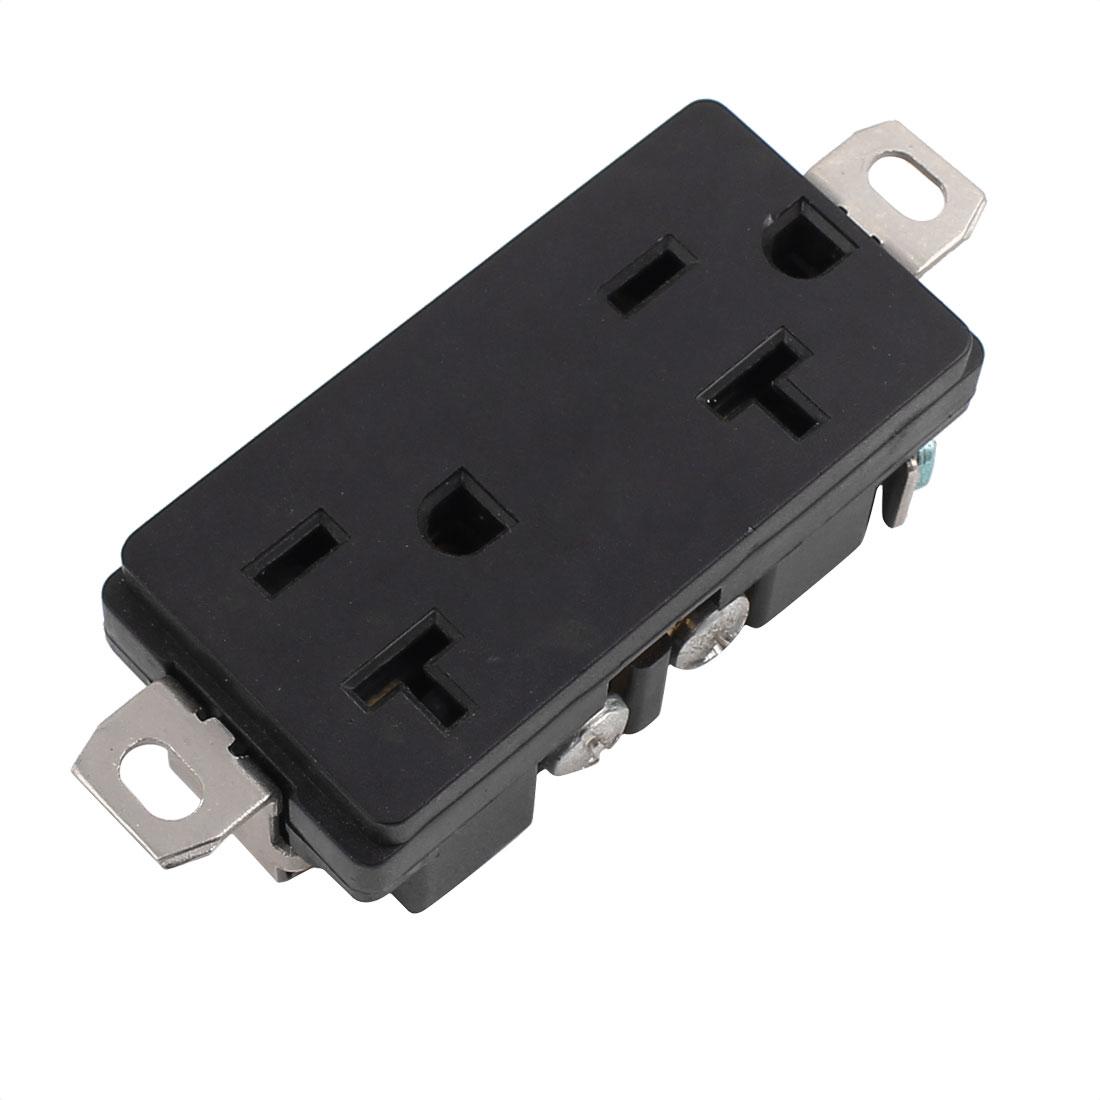 125V 20A US Twist Lock Tamper-Resistant Duplex Receptacle Power Outlet